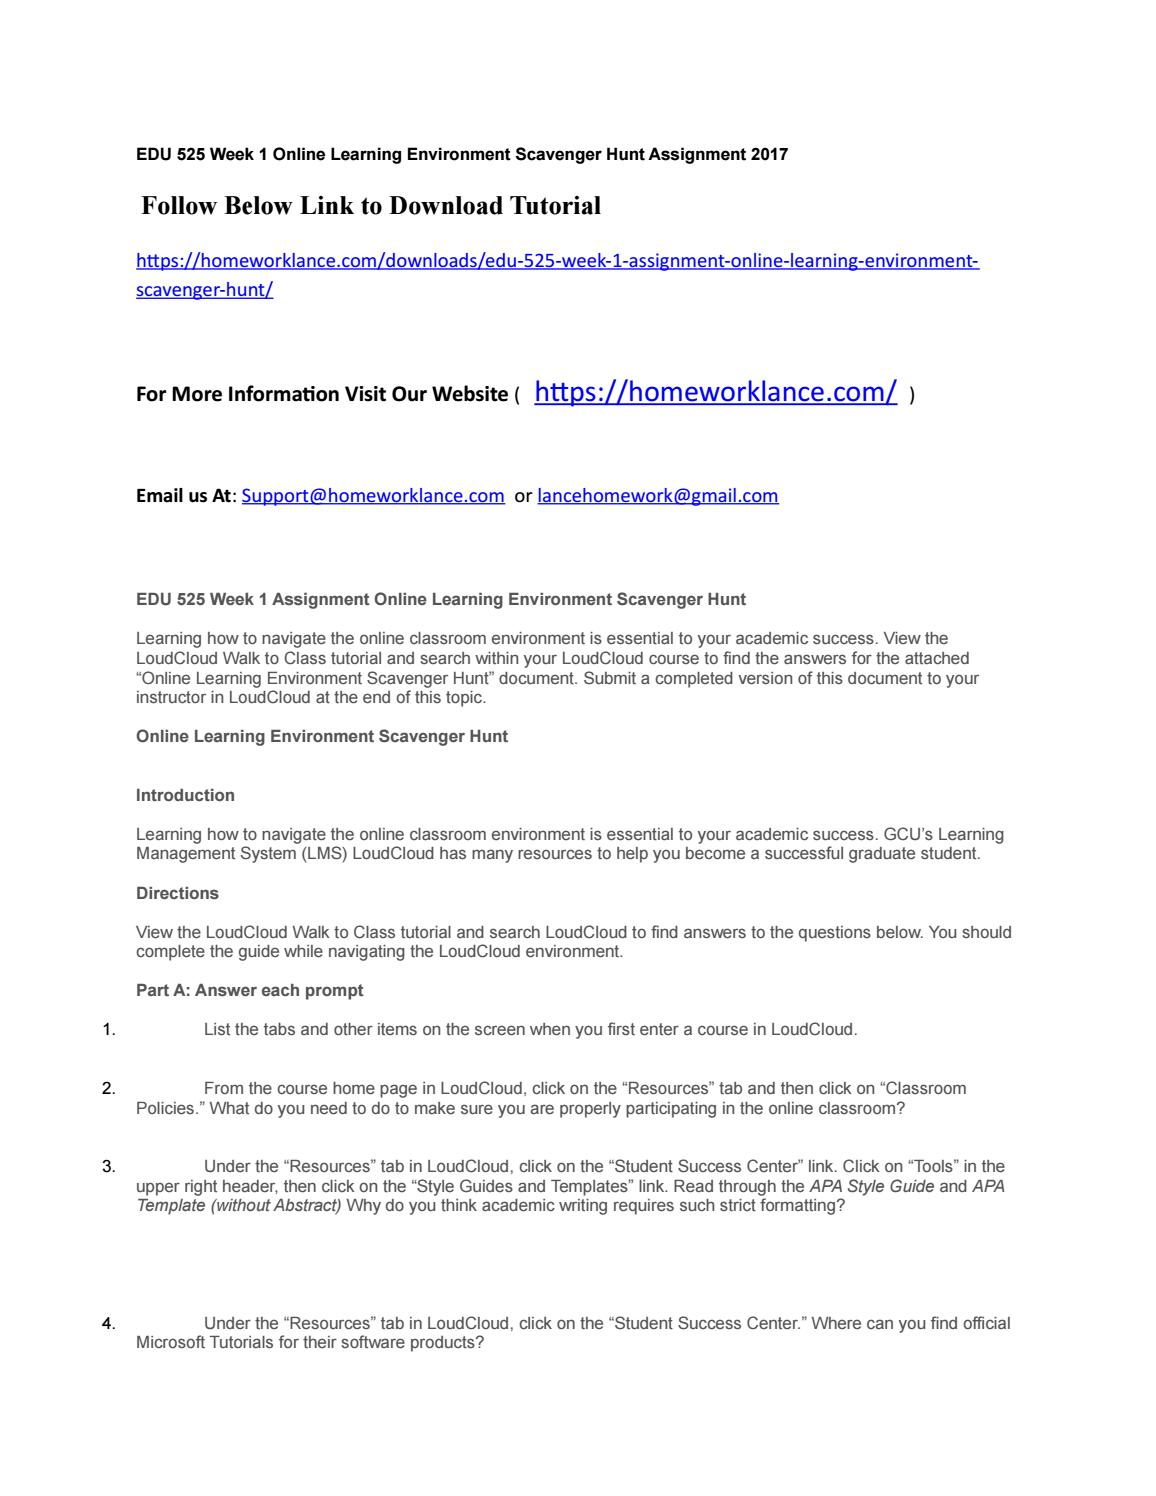 Boorman review interim report definition